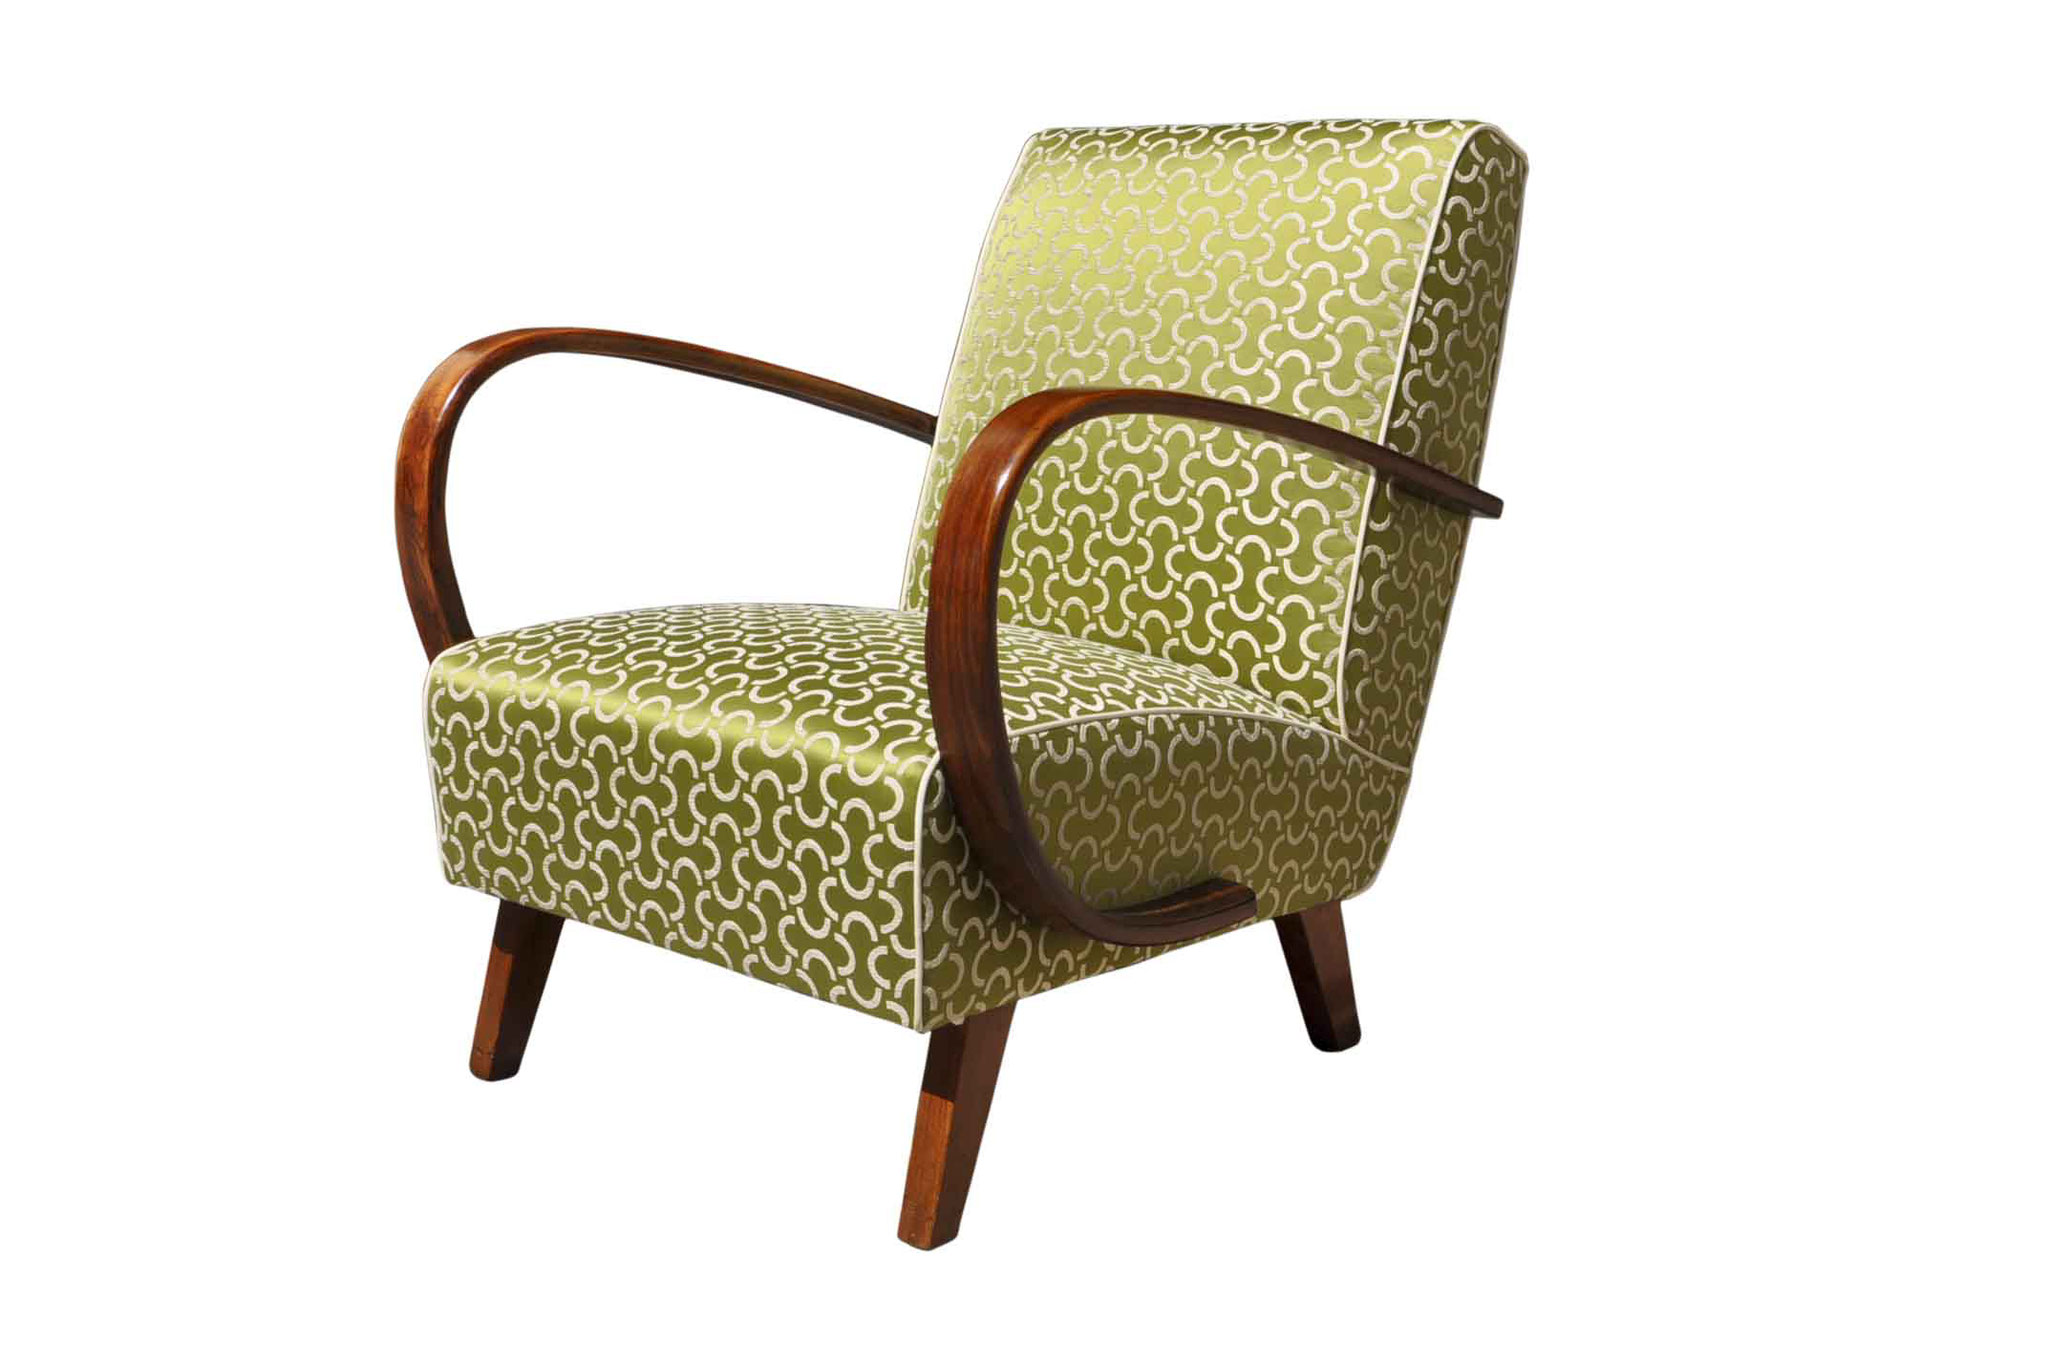 art deco bentwood chair 1930s